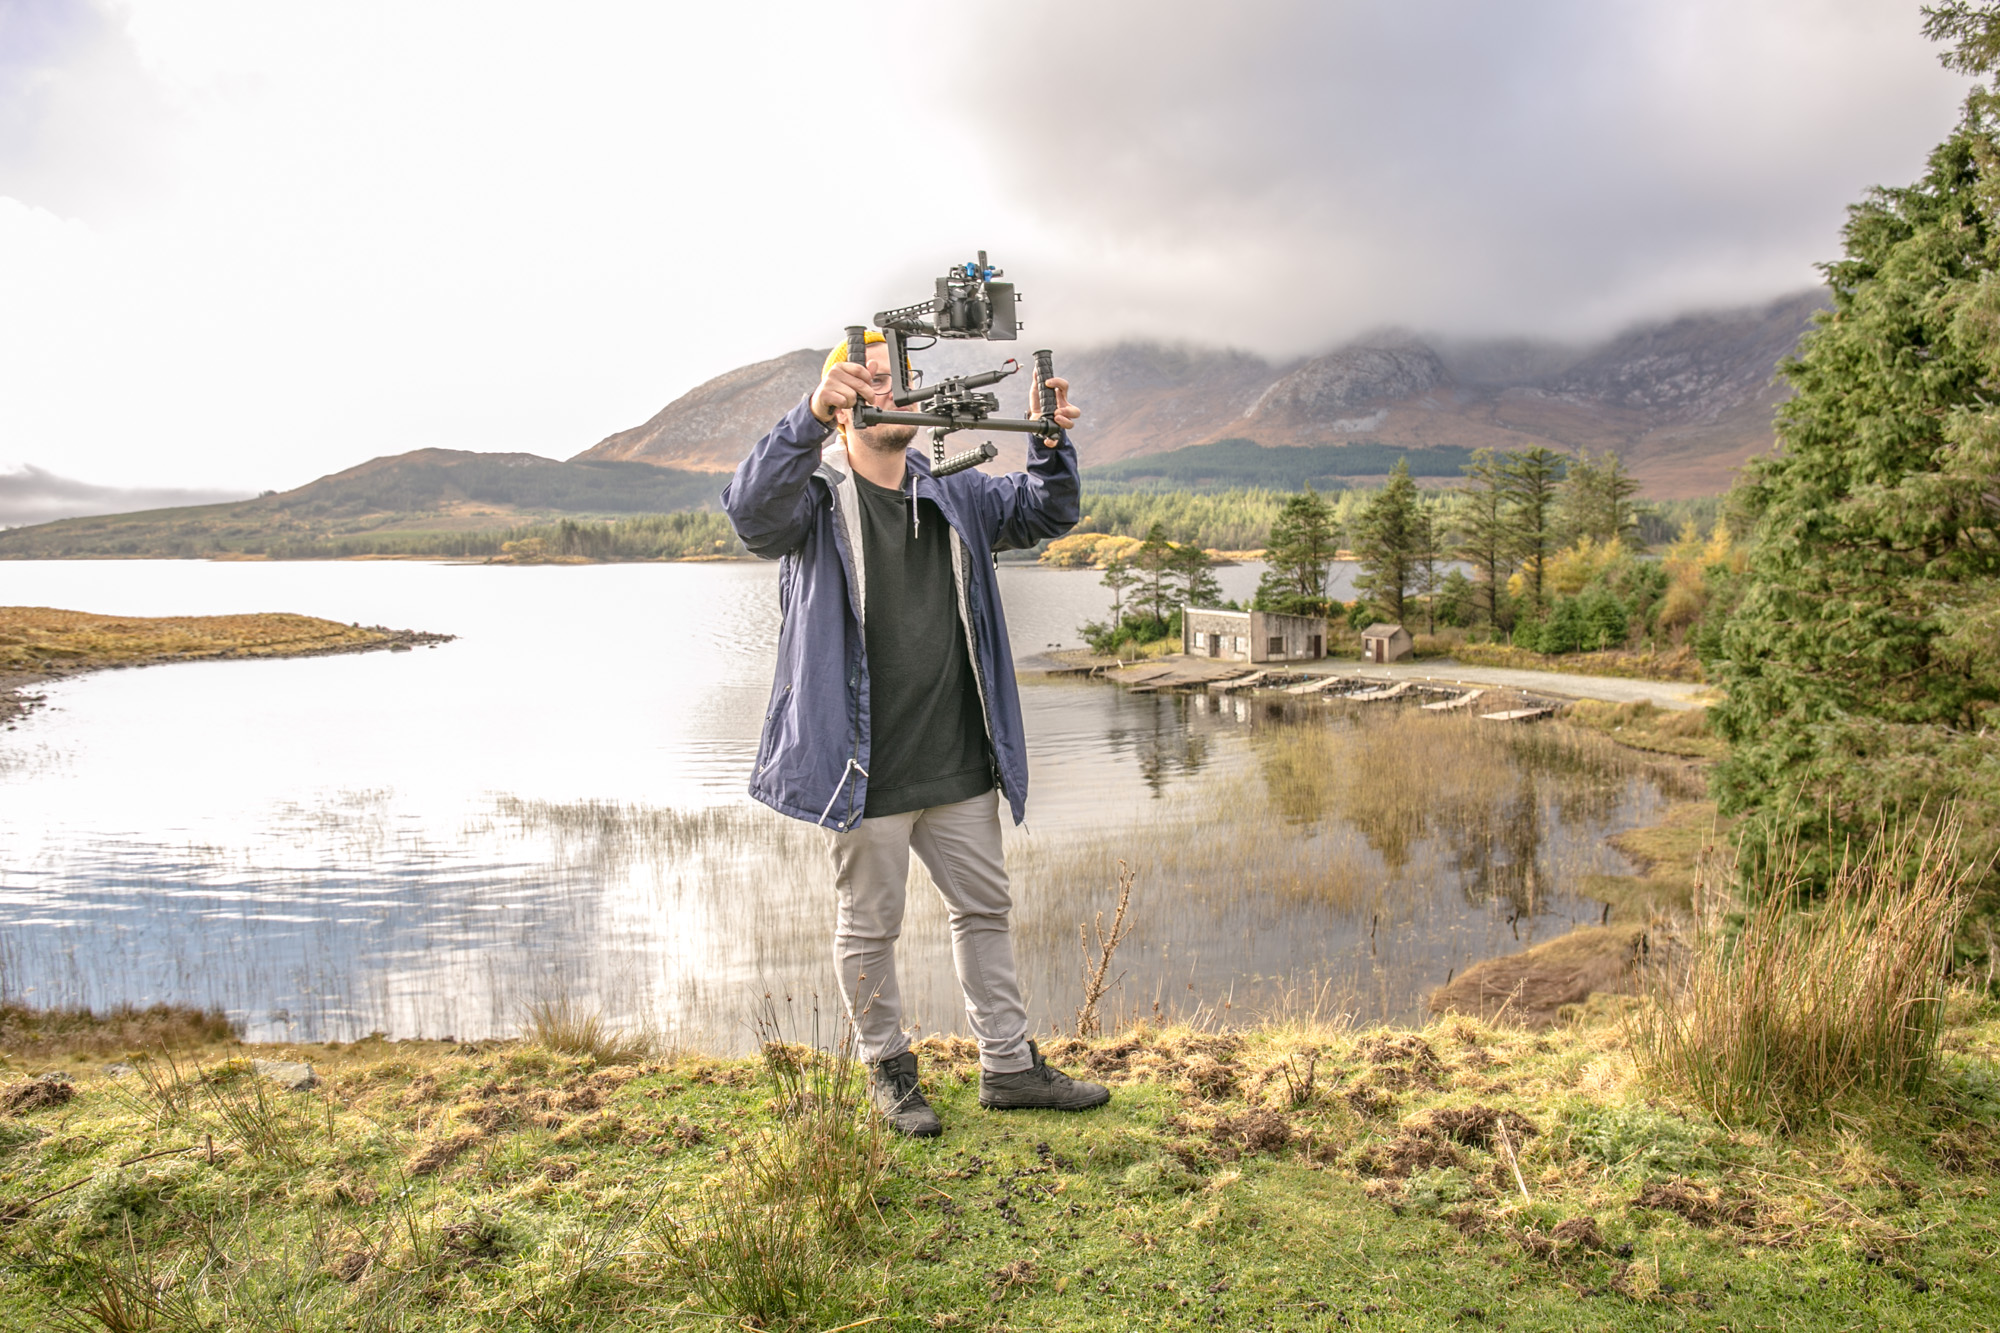 Tomek Ciezki, Filming In Connemara for Food on the Edge 2016